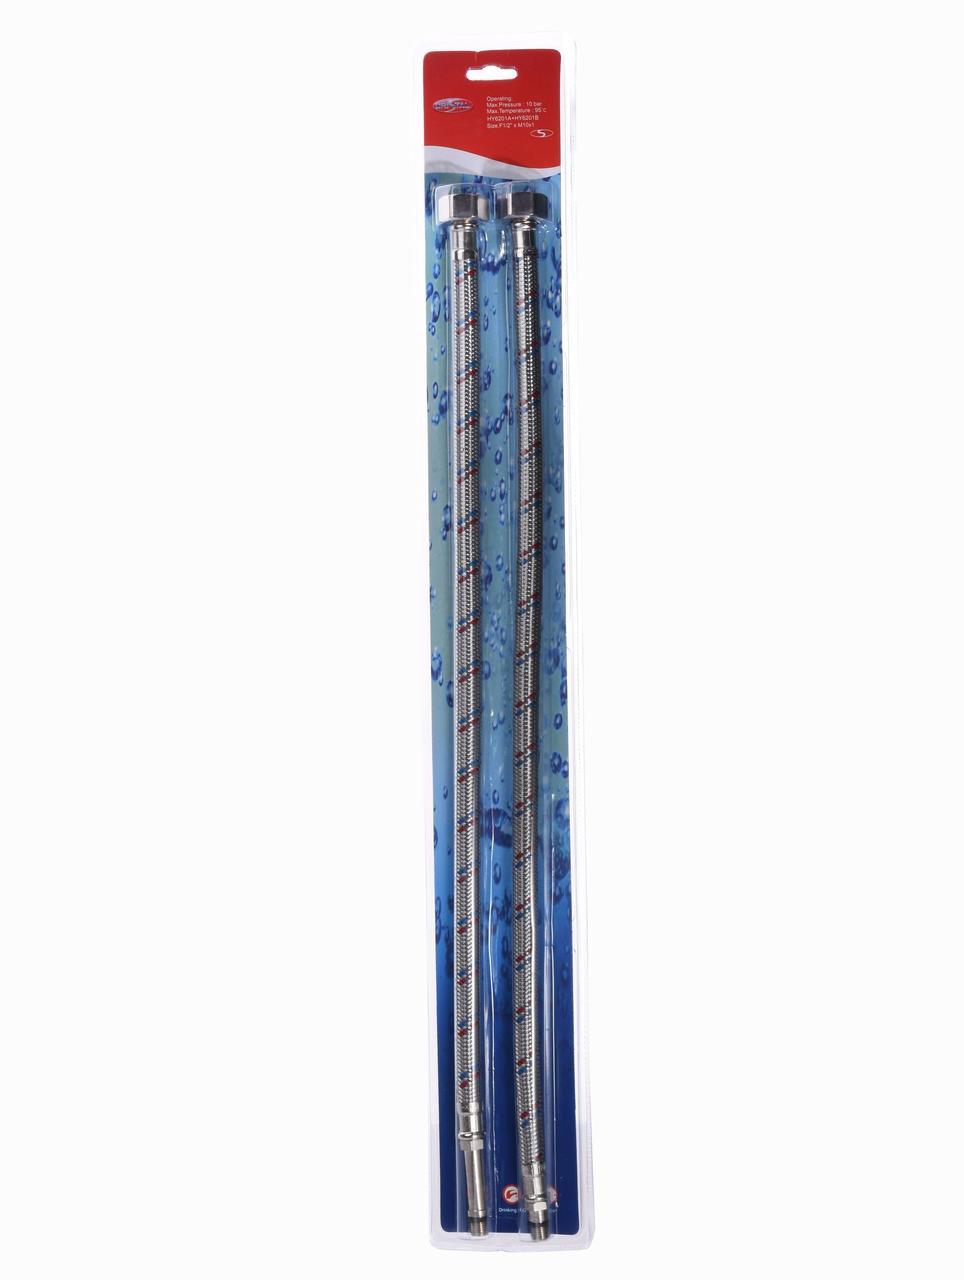 "Шланг для смесителя Solomon (нерж.) М10х1/2"" 0,8м (HY6201 A+B)  ПАРА в блистере"